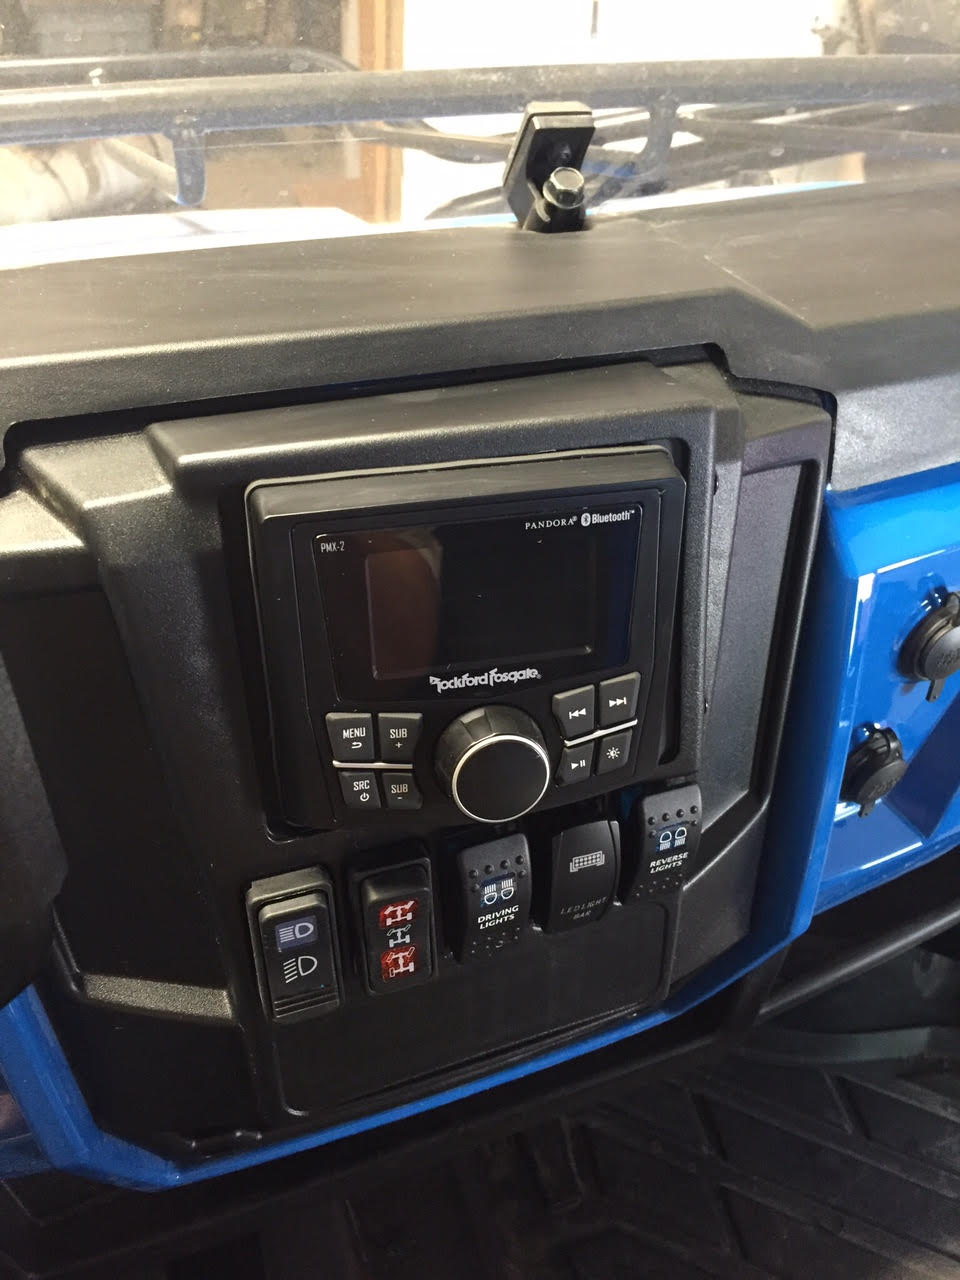 Polaris Head Unit >> Polaris Ranger Full Size Dash Mounted Audio Radio Kit - Rockford Fosgate PMX-2 Head Unit ...